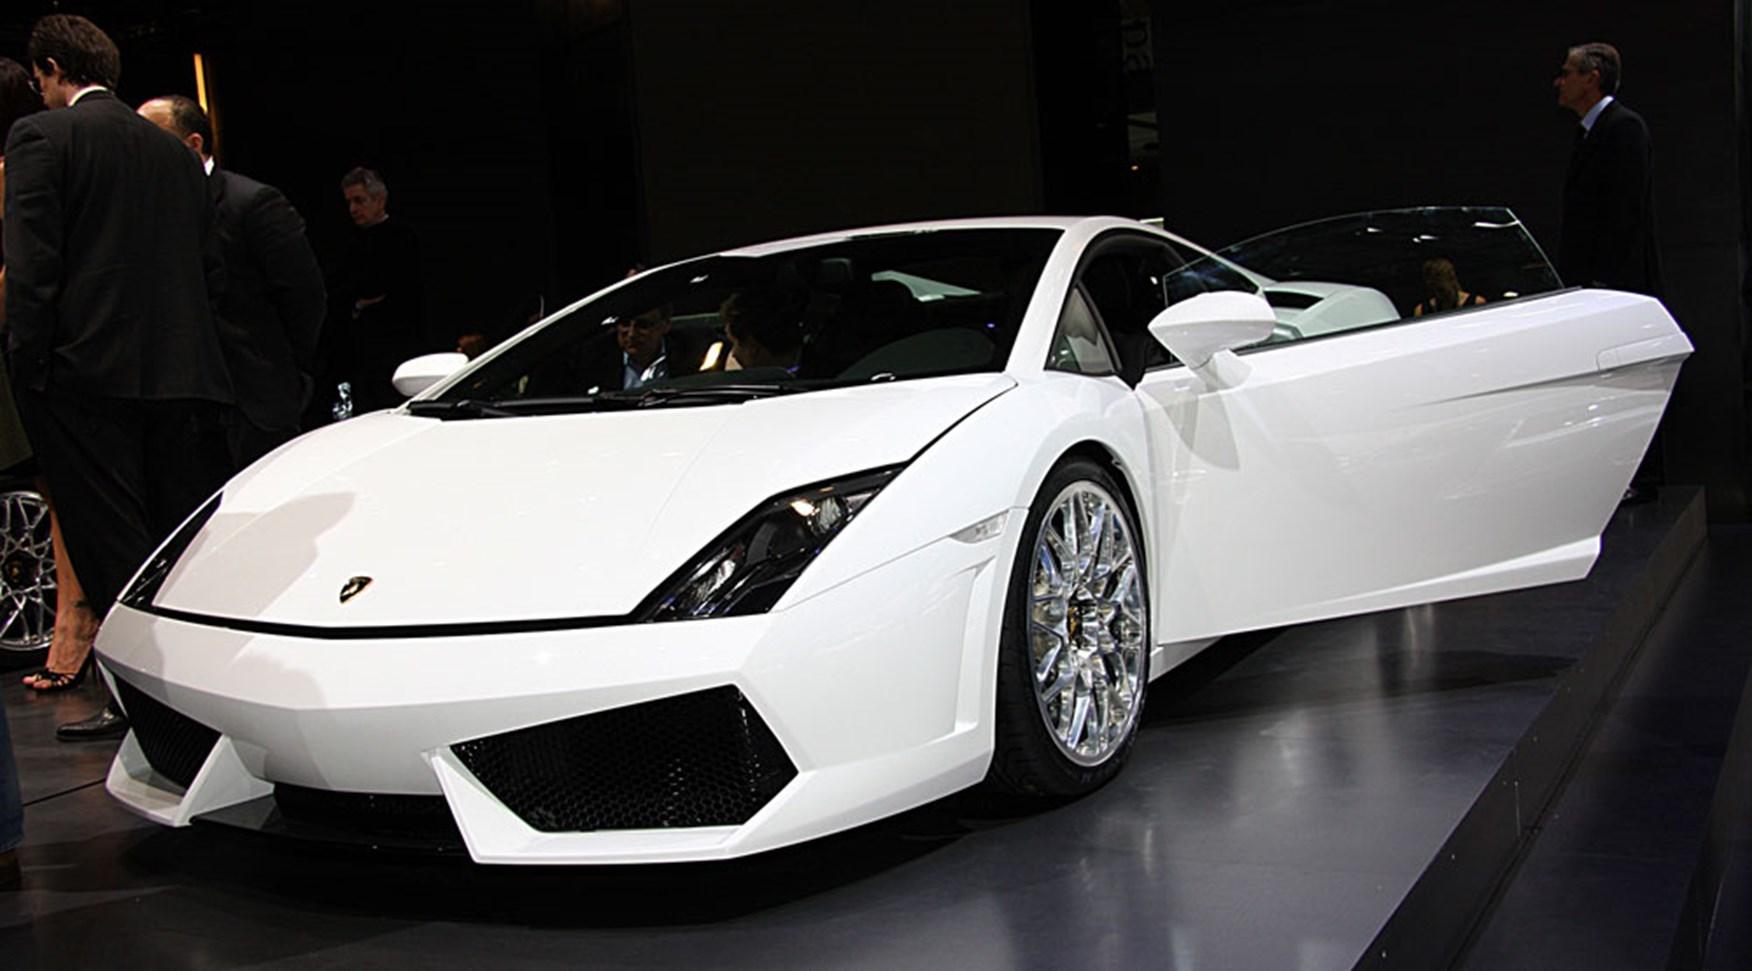 Lamborghini Gallardo Lp560 4 Car Magazine